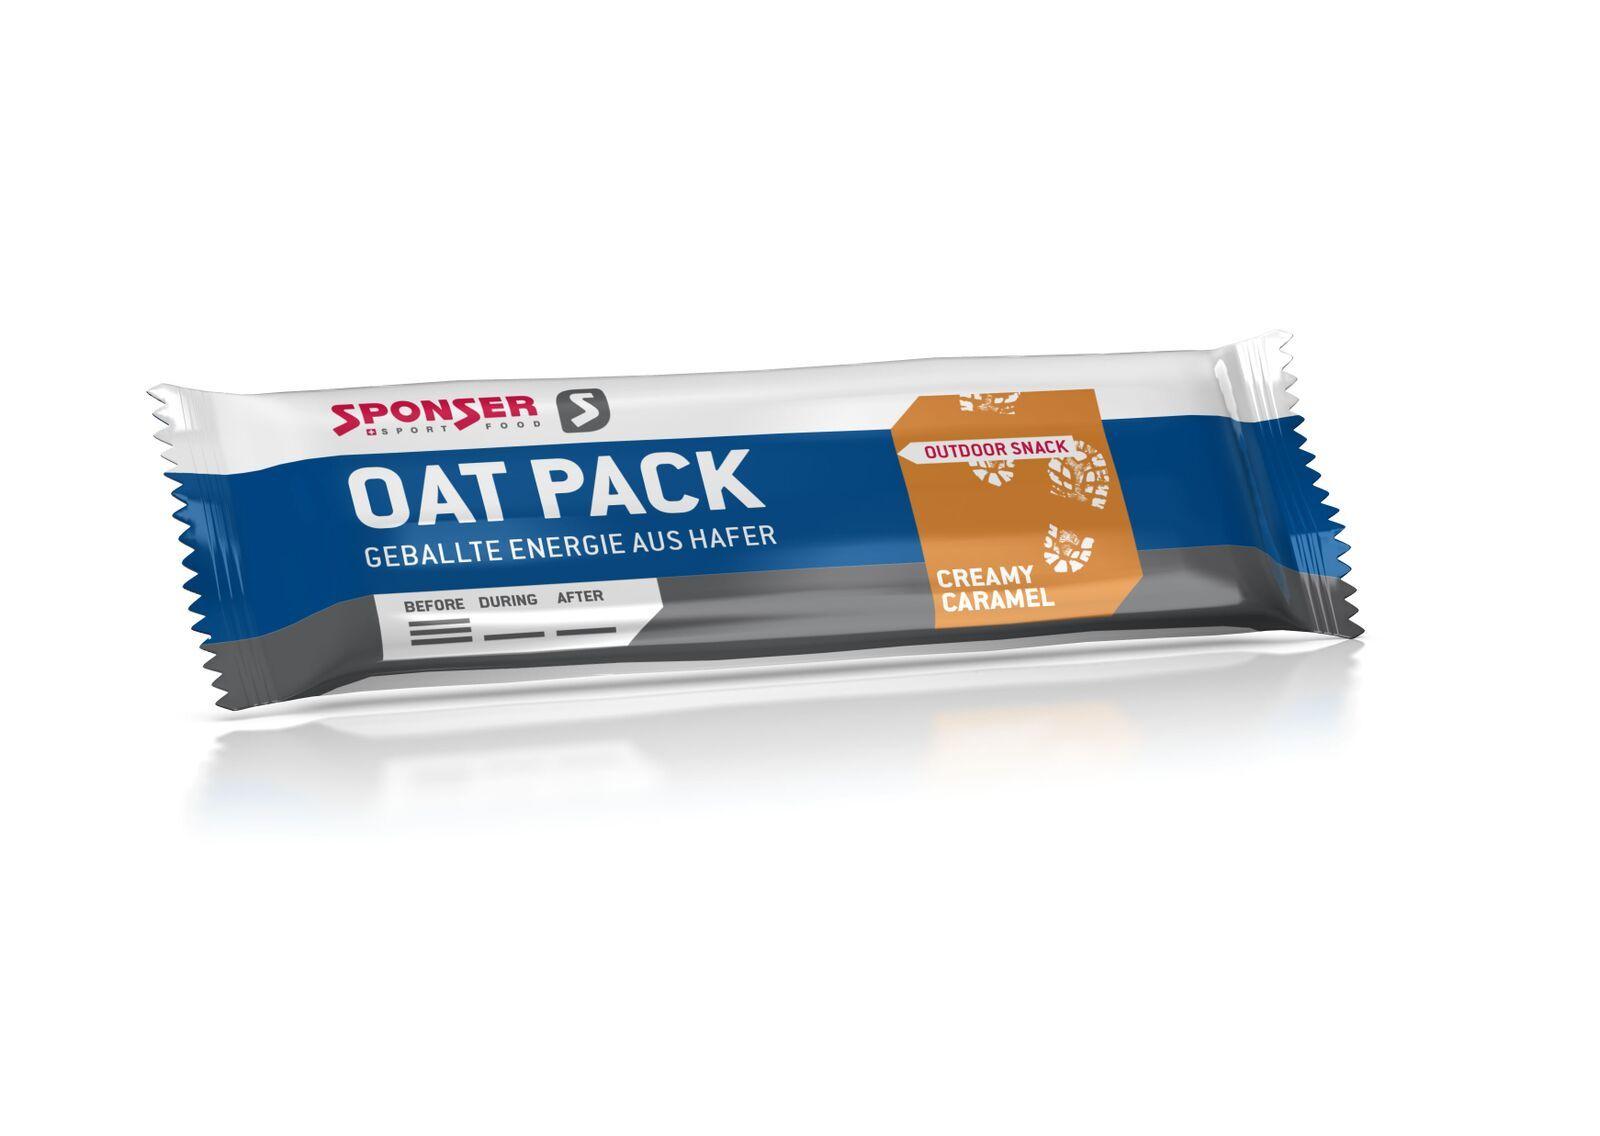 Oat Pack - 25x50g - Creamy Caramel MHD 31.07.2018